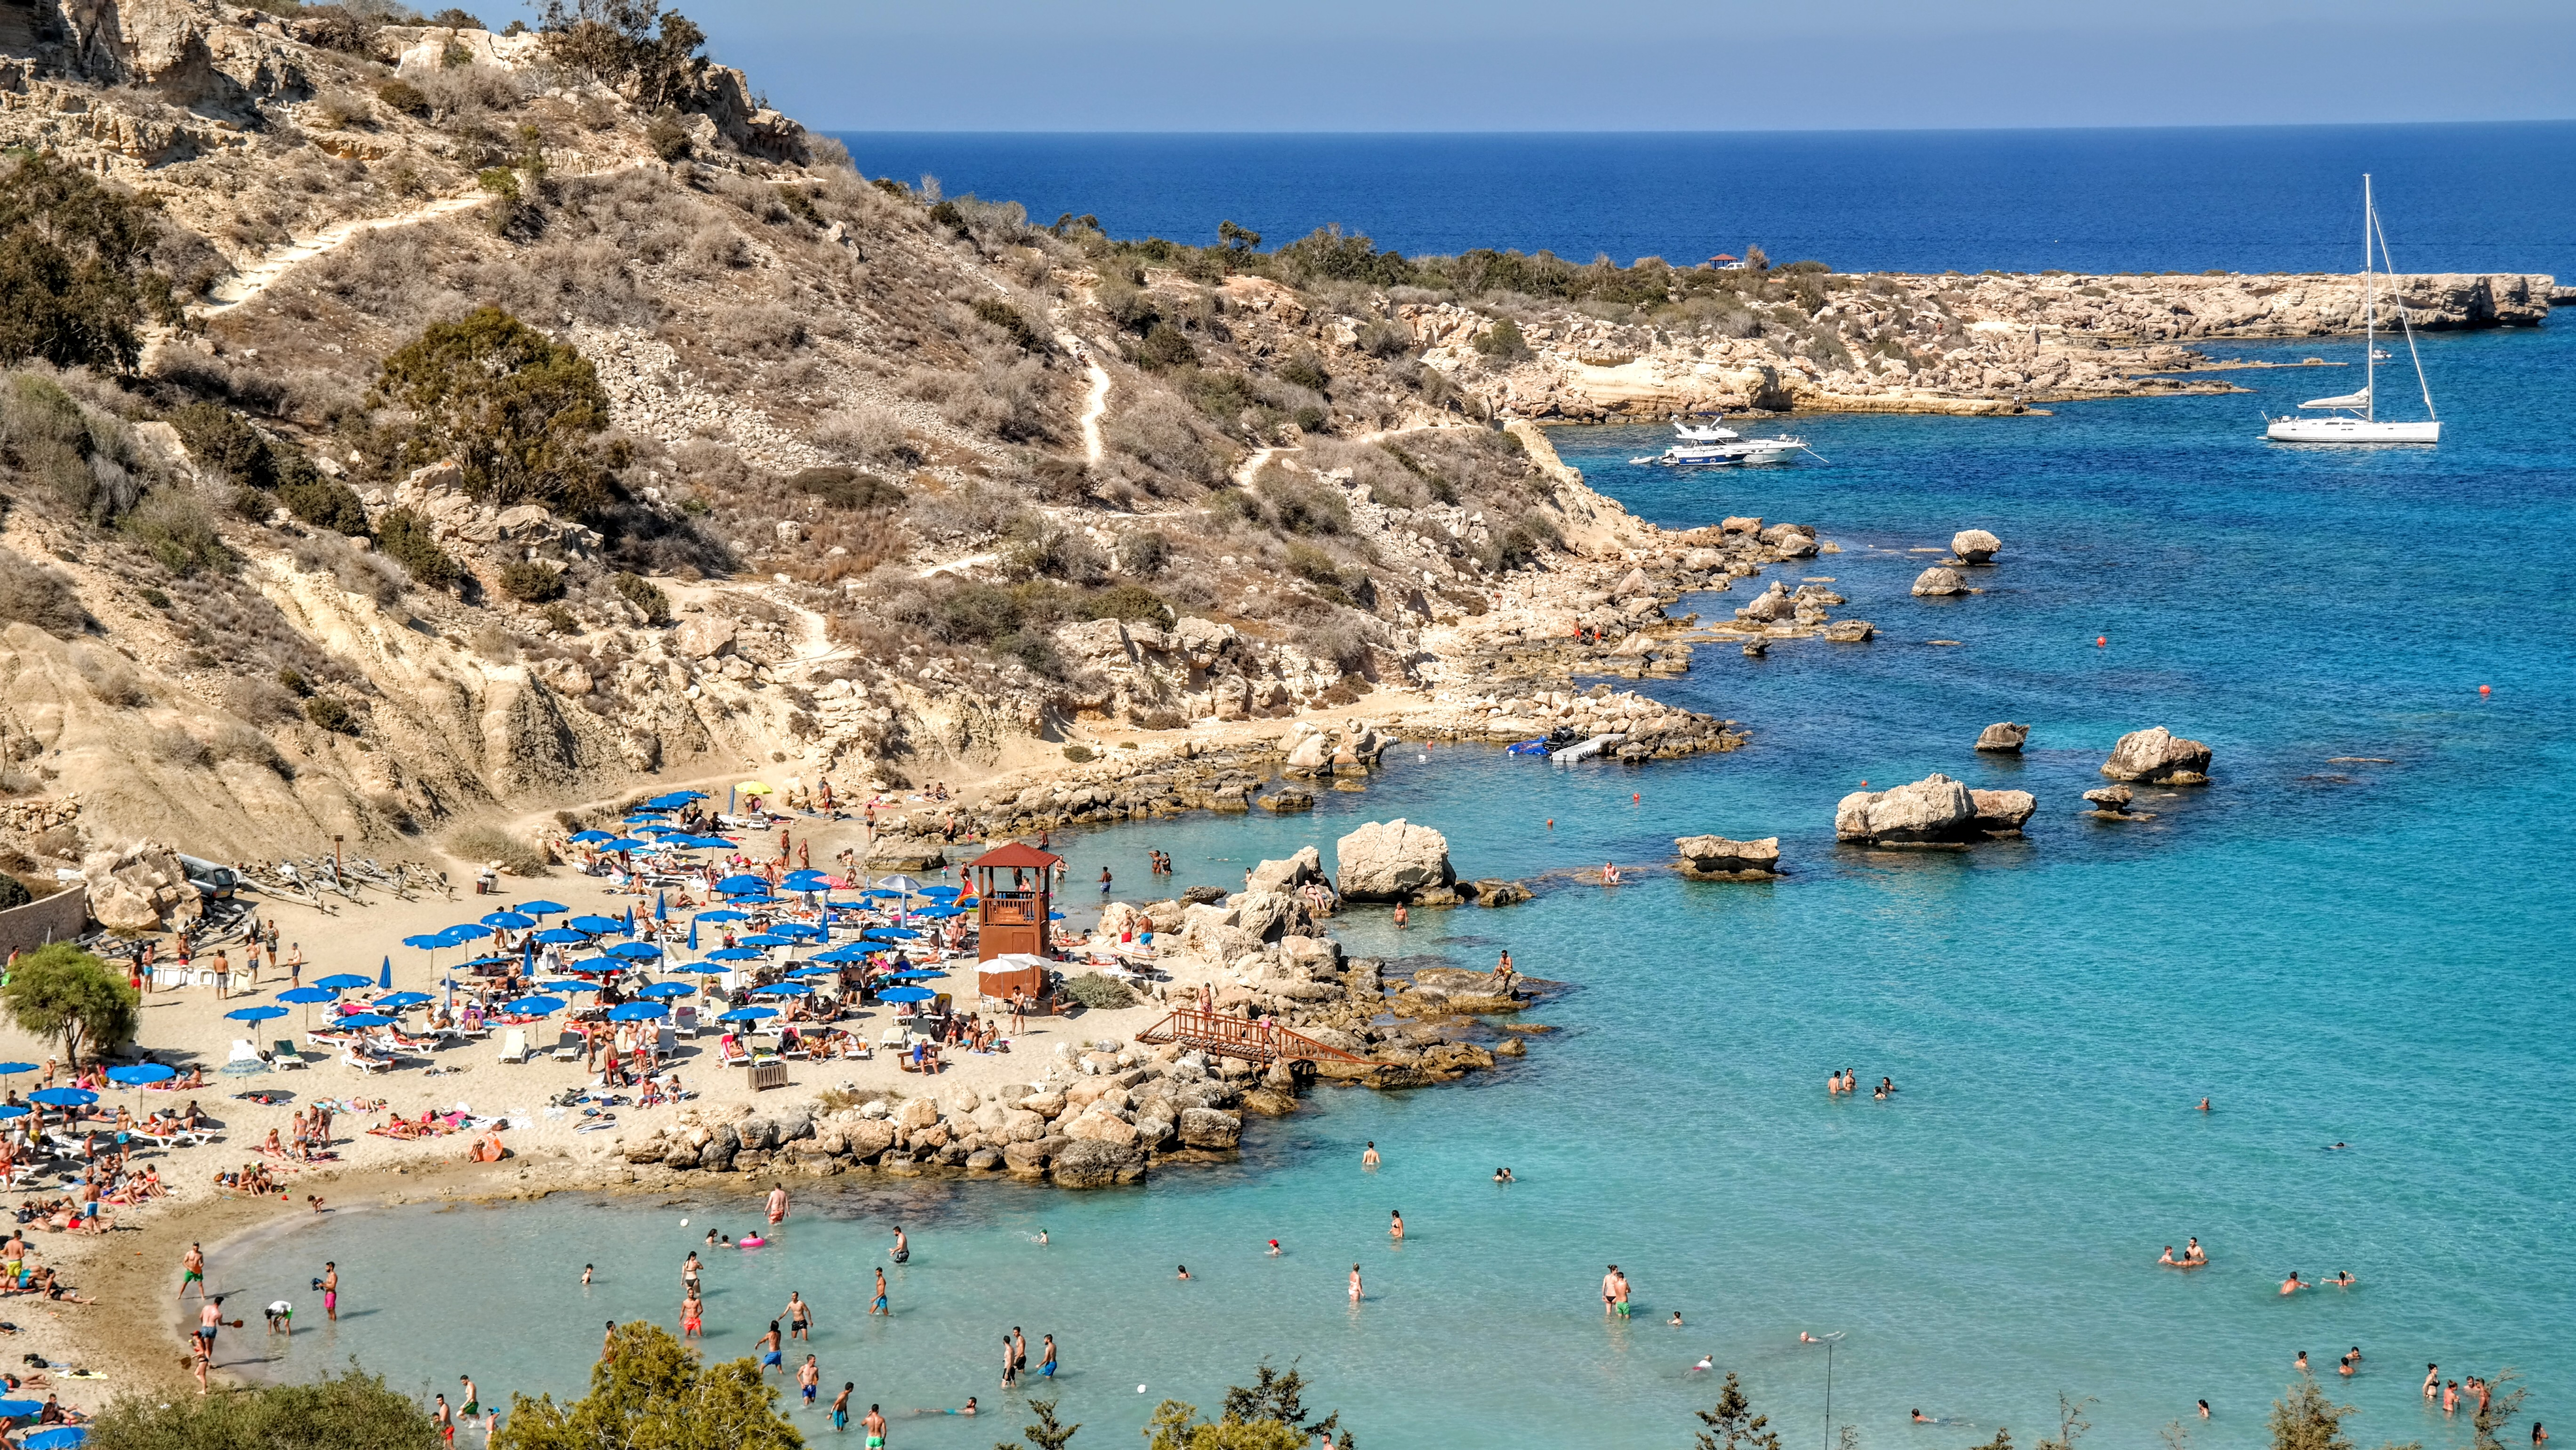 Cypr-Zatoka Konnos